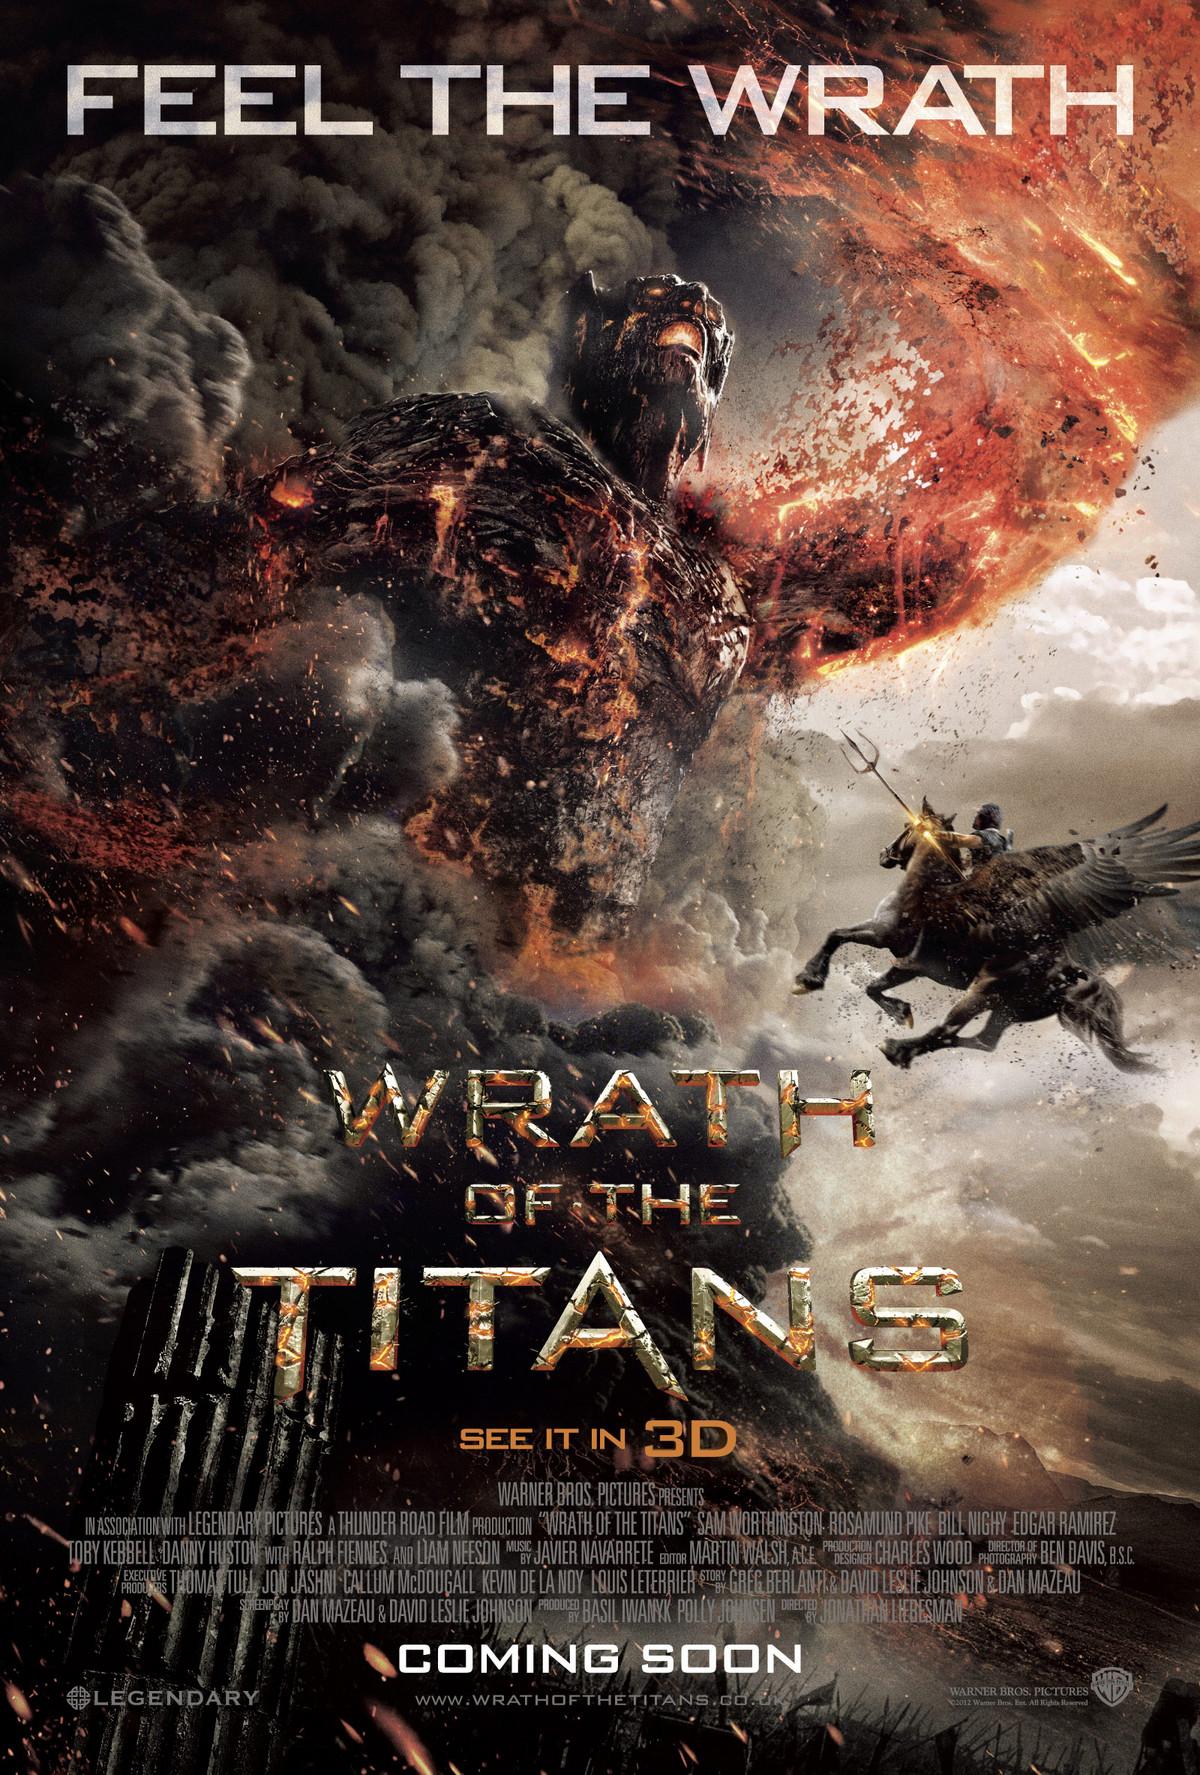 Wrath of the Titans - Movie Poster #1 (Original)